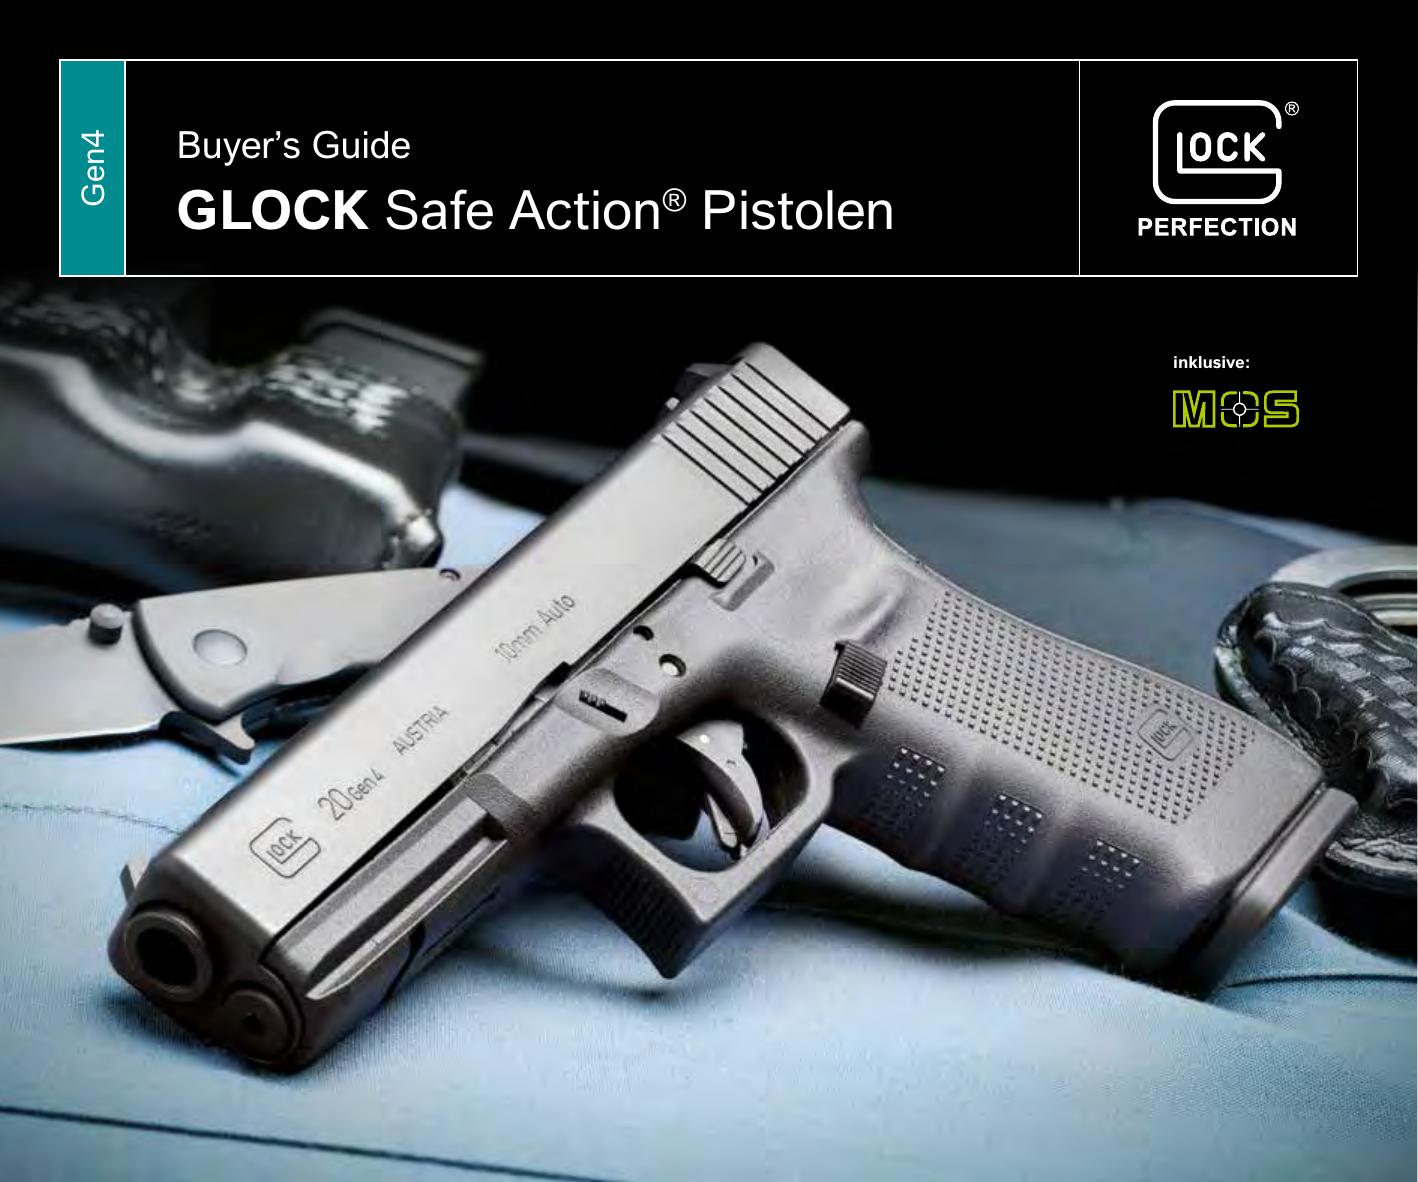 GLOCK Safe Action® Pistolen   manualzz.com